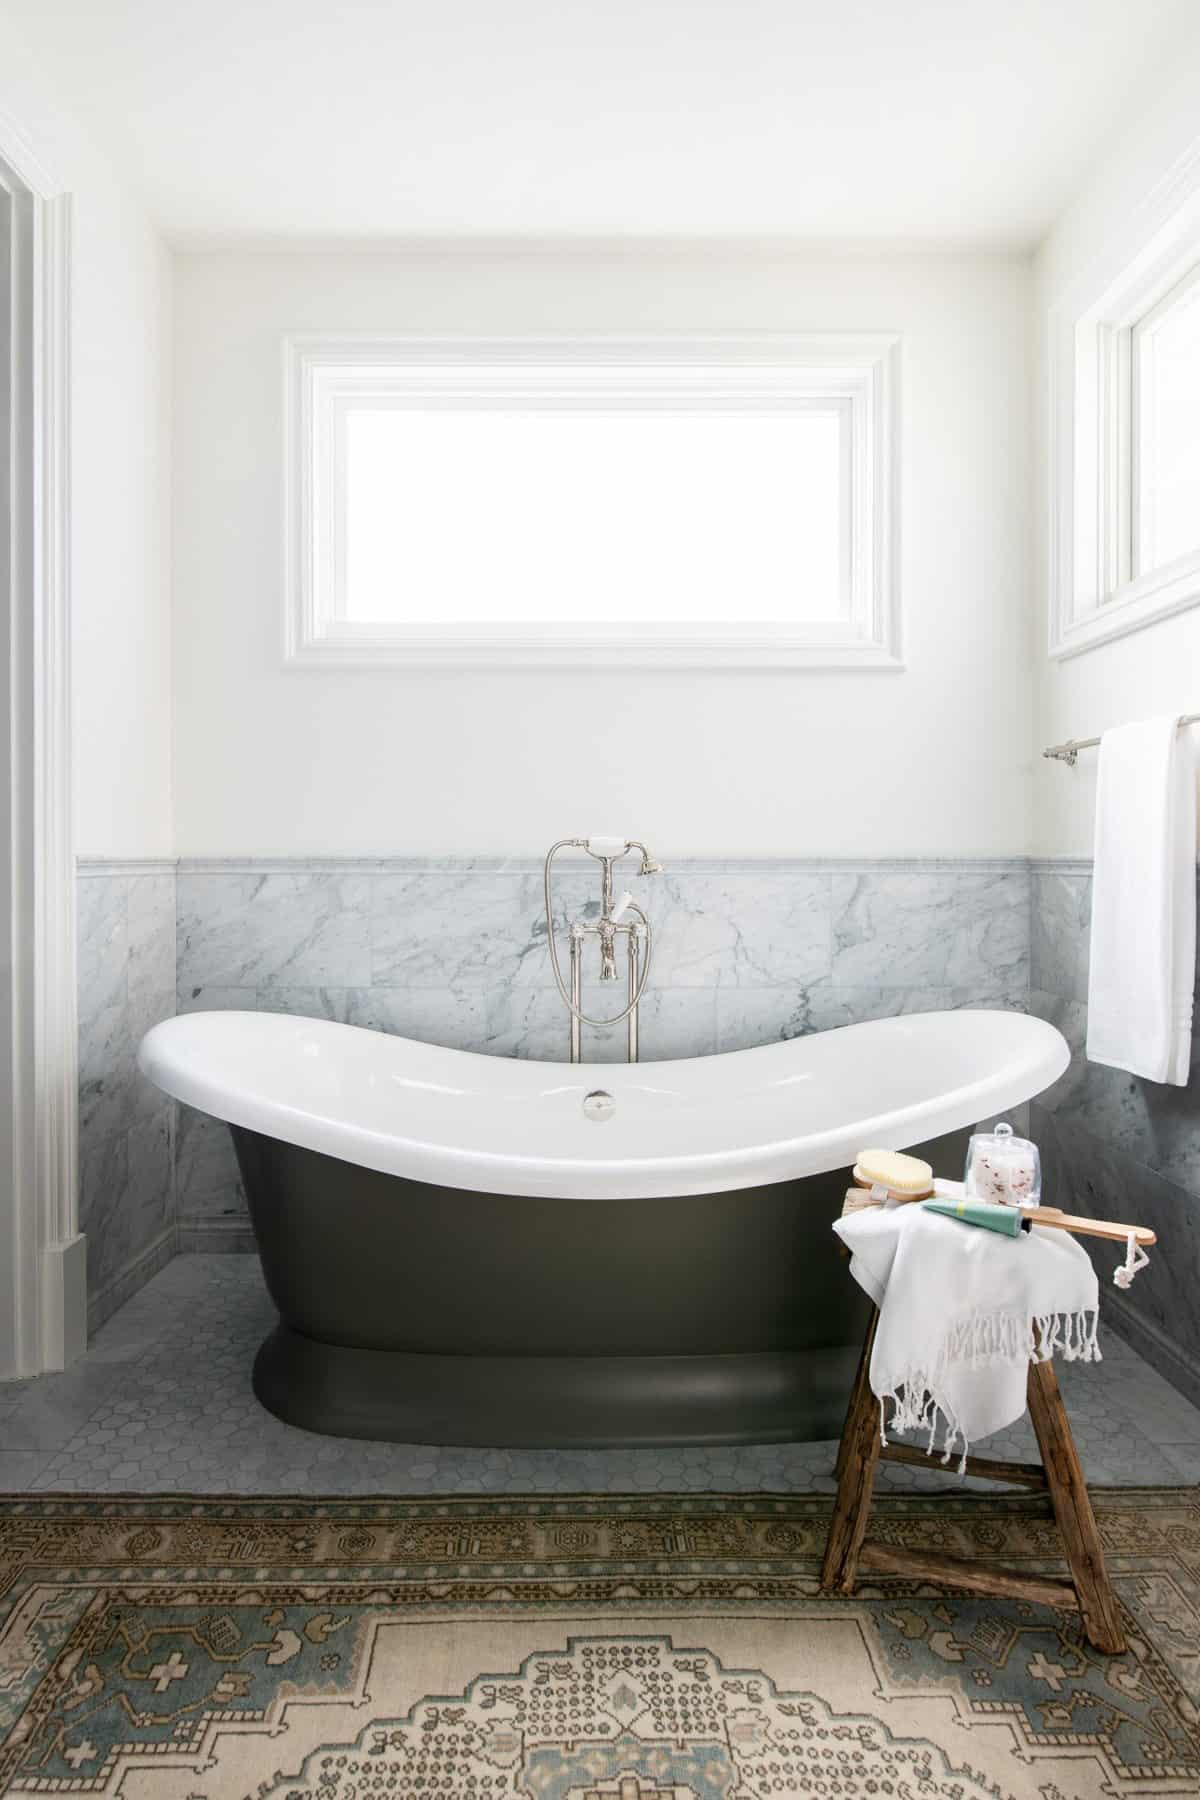 beach-style-bathroom-freestanding-tub